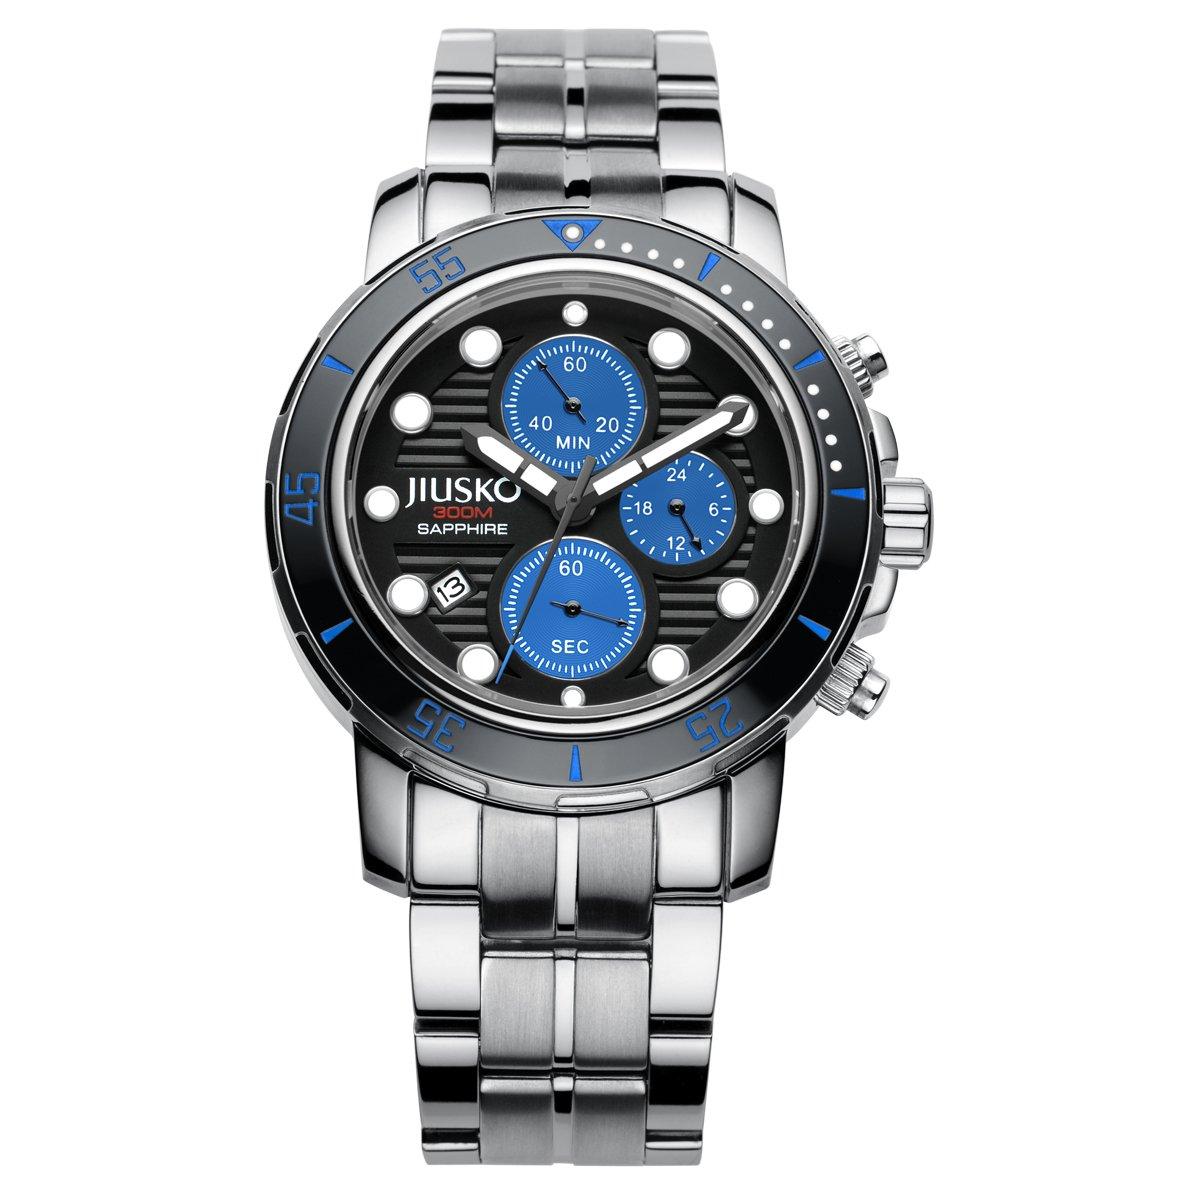 Jiusko 76LSB08 JIUSKO Deep Sea Series Titanium Quartz Chronograph Silver, Blue, Men's Dive Watch by JIUSKO